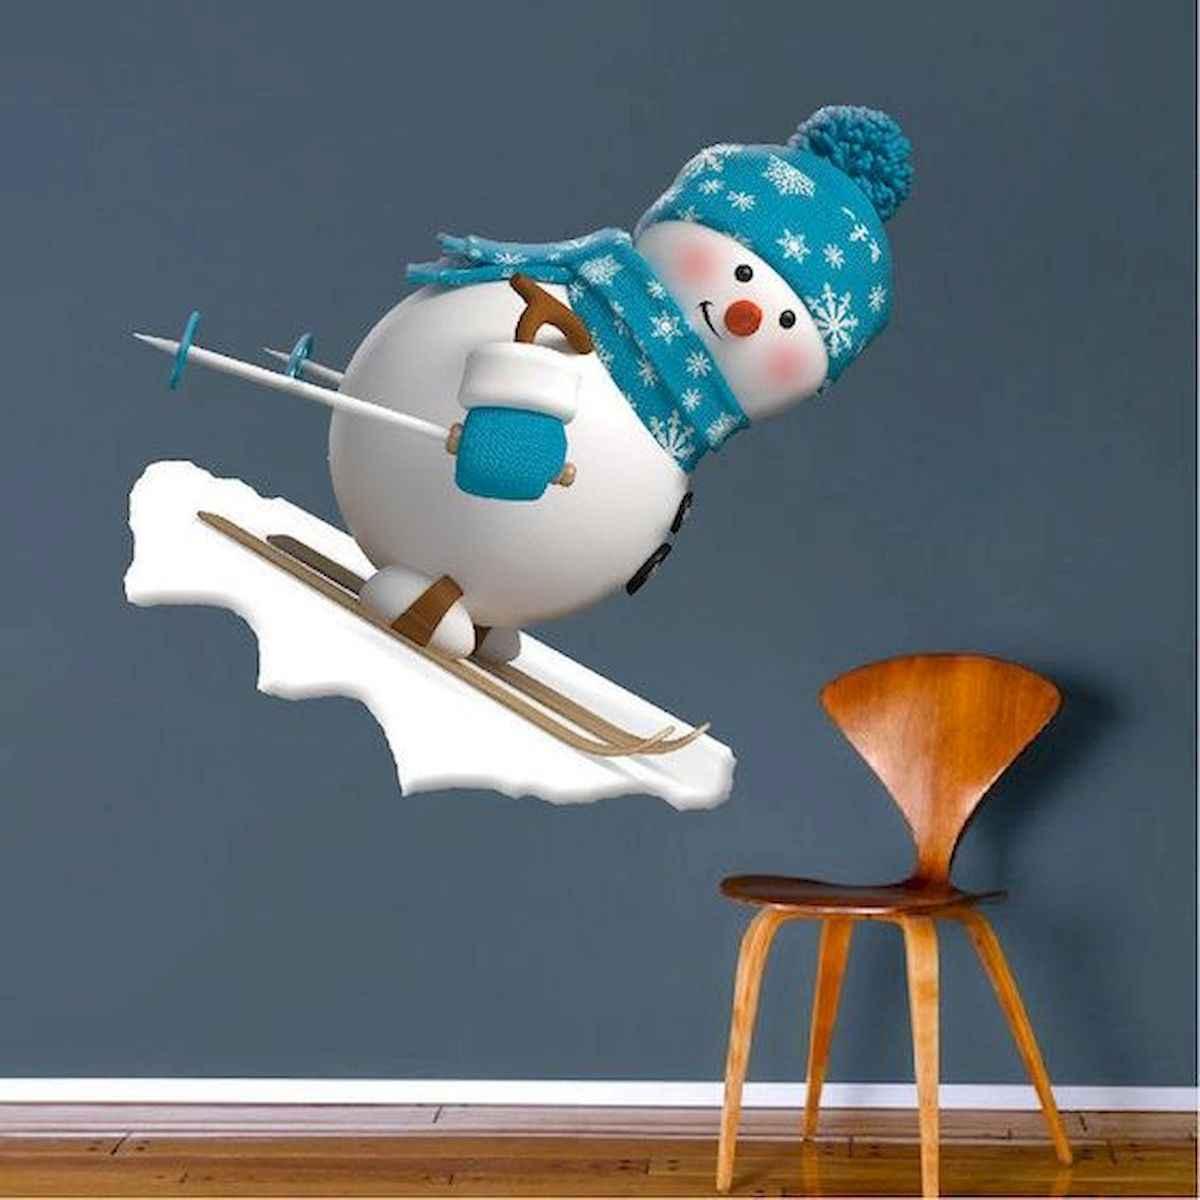 35 Awesome Apartment Christmas Decor Ideas (6)